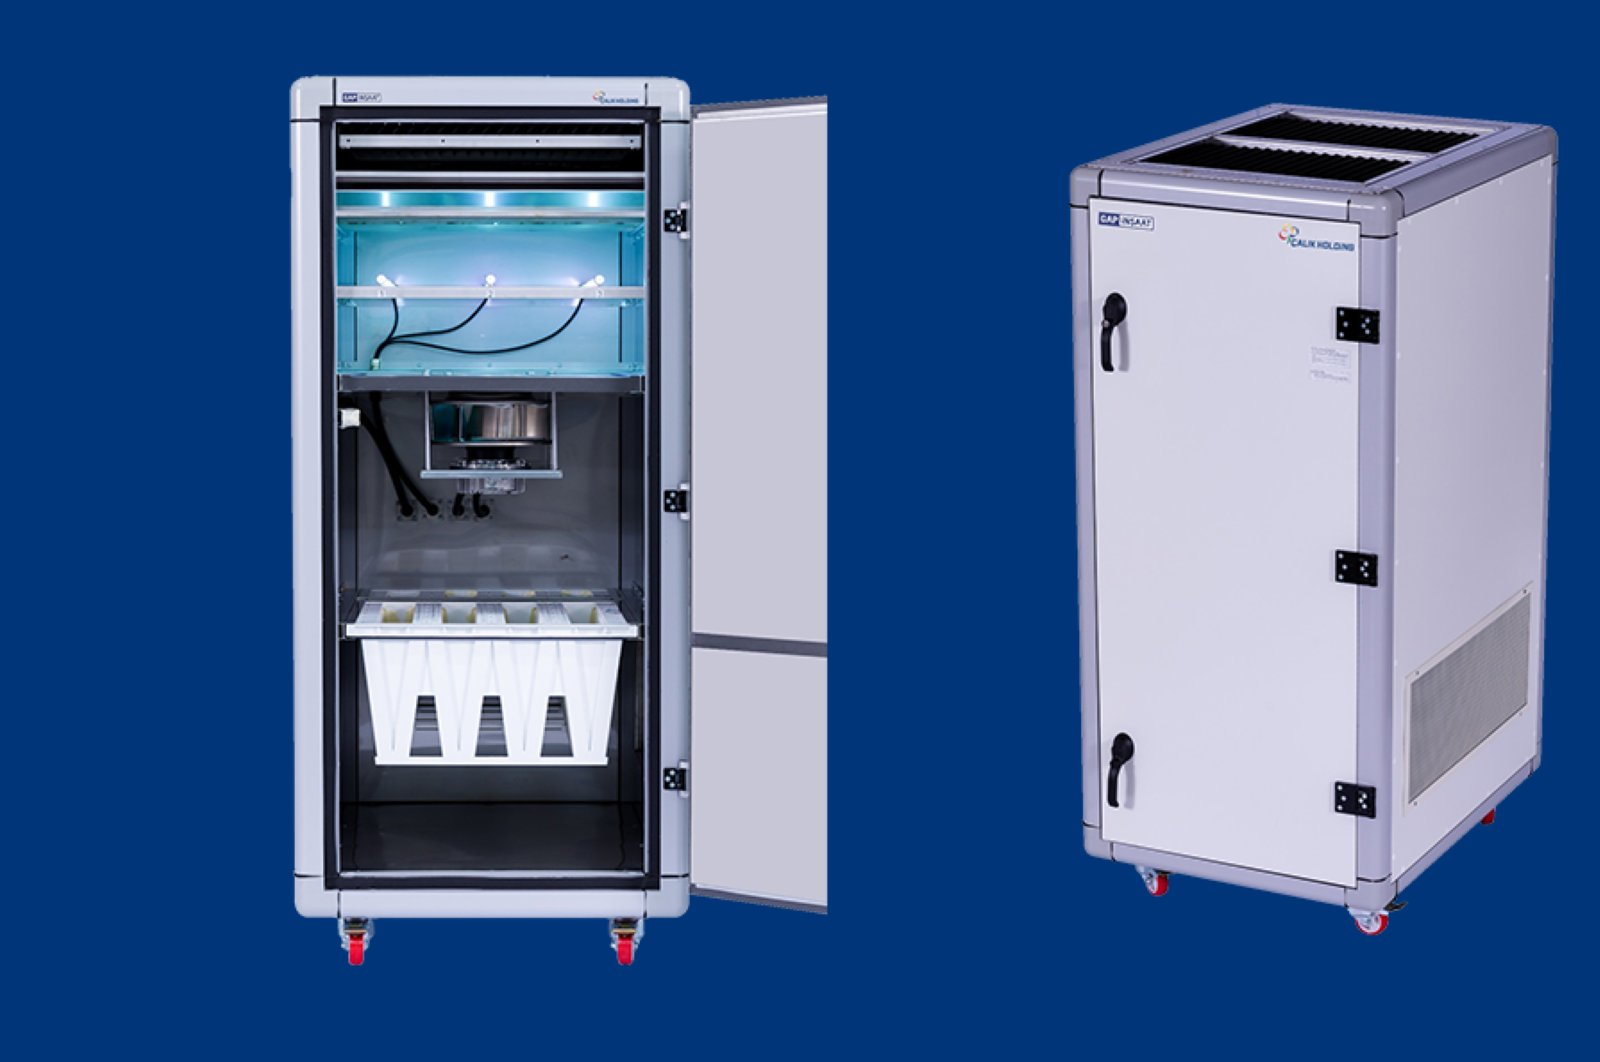 Air purifiying device developed by Çalık Holding subsidiary GAP İnşaat. (Photo courtesy of GAP İnşaat)